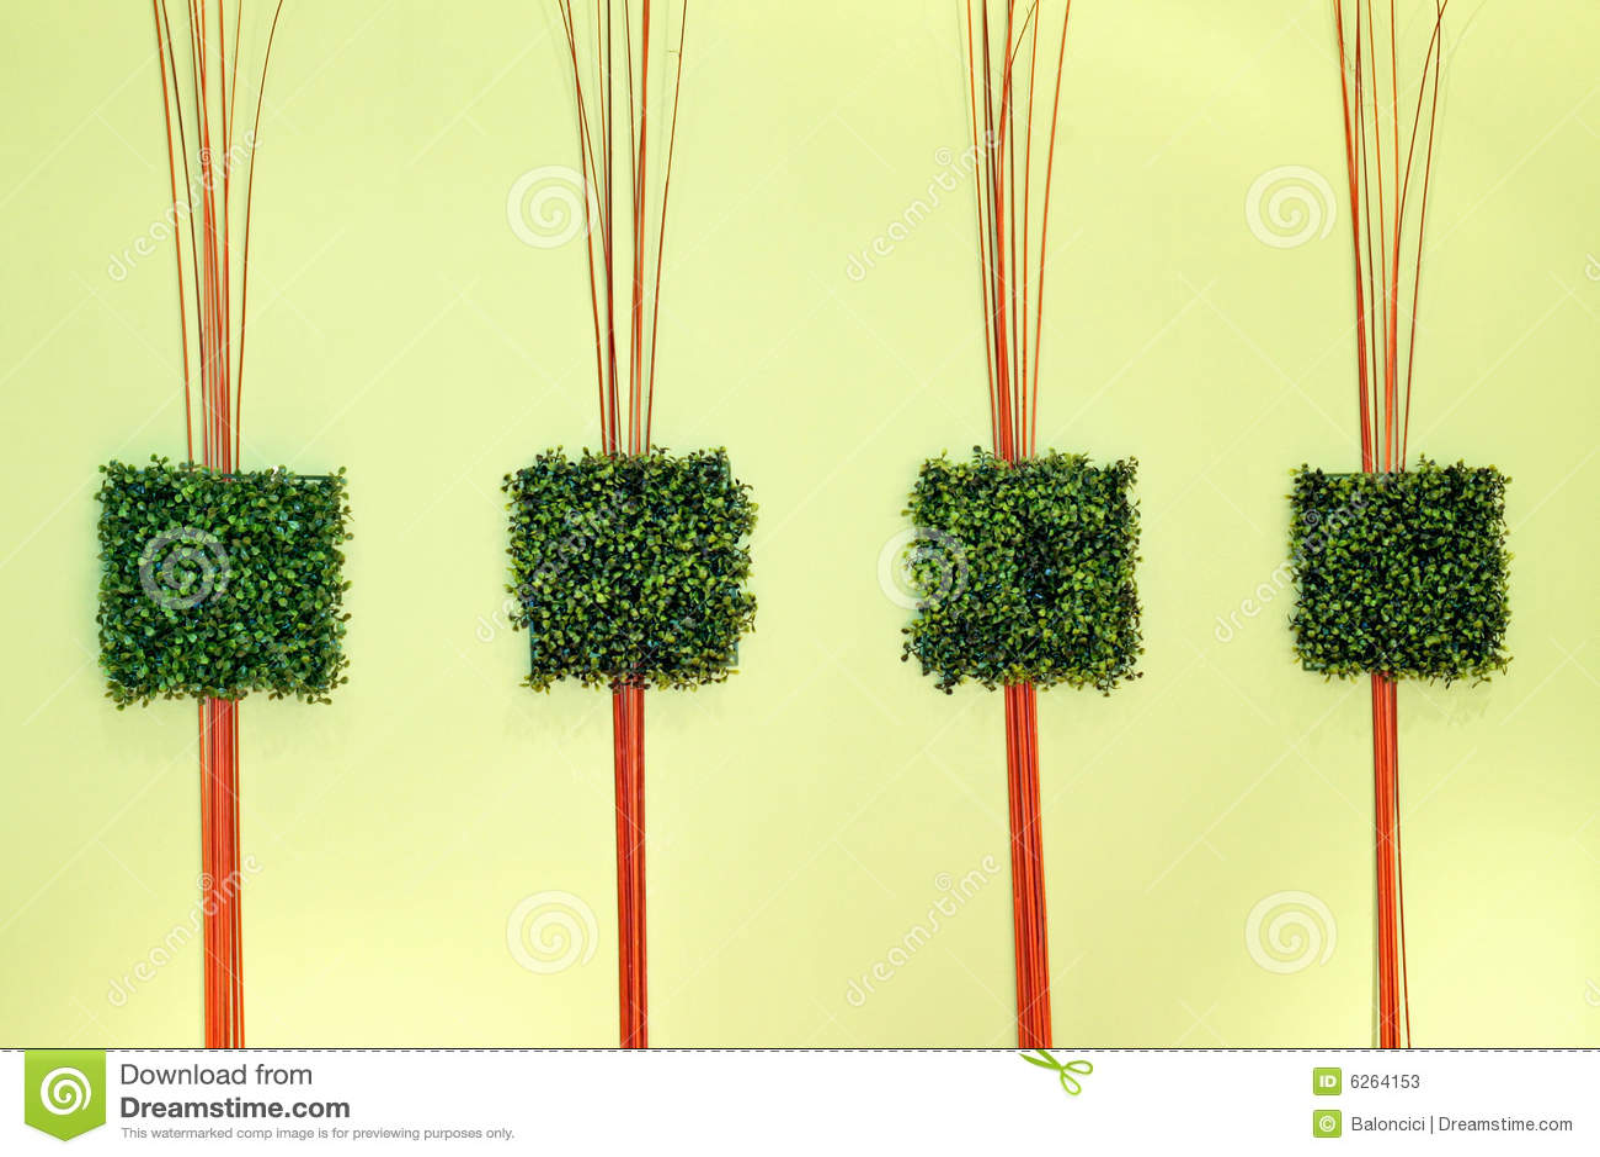 Green grass decor stock image. Image of style, interior ...